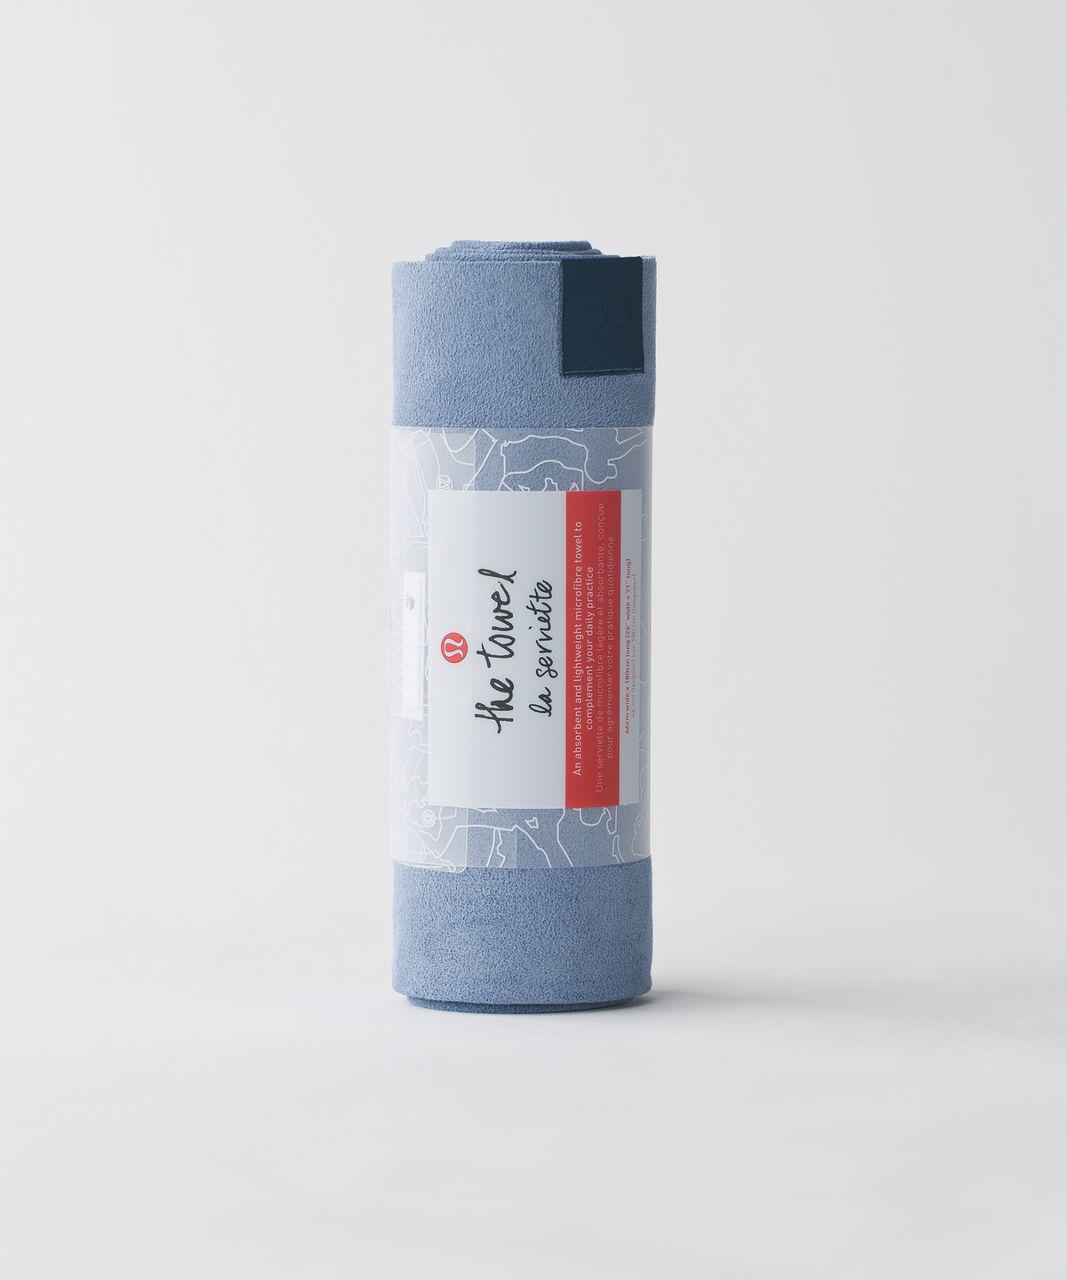 Lululemon The Towel - Tempest Blue